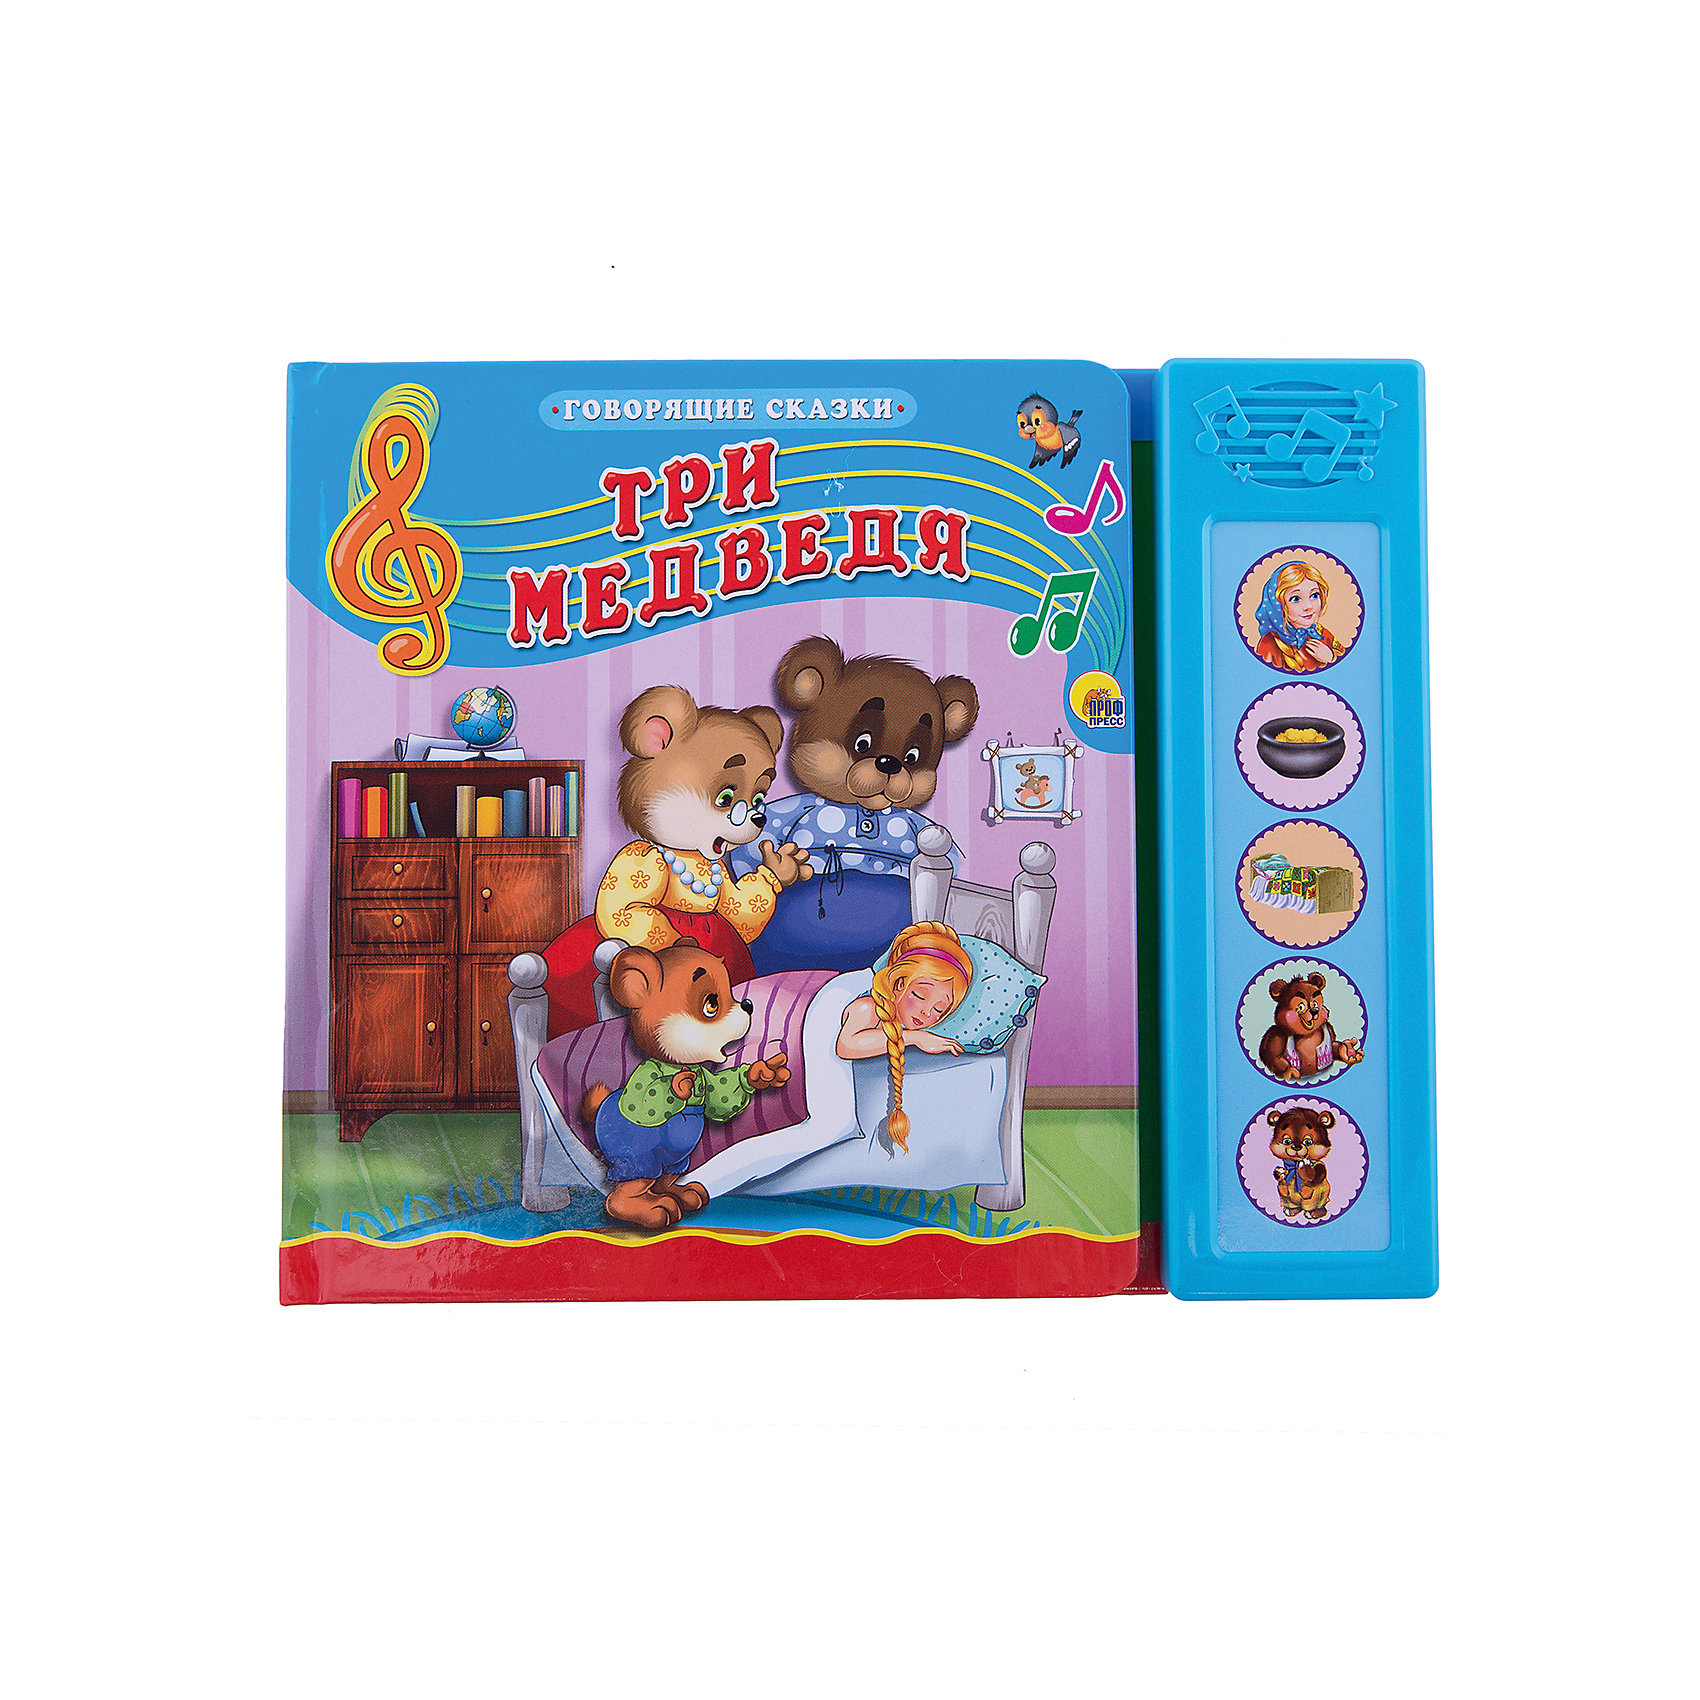 Проф-Пресс Говорящие сказки. Три медведя музыкальные книжки проф пресс говорящие сказки золушка